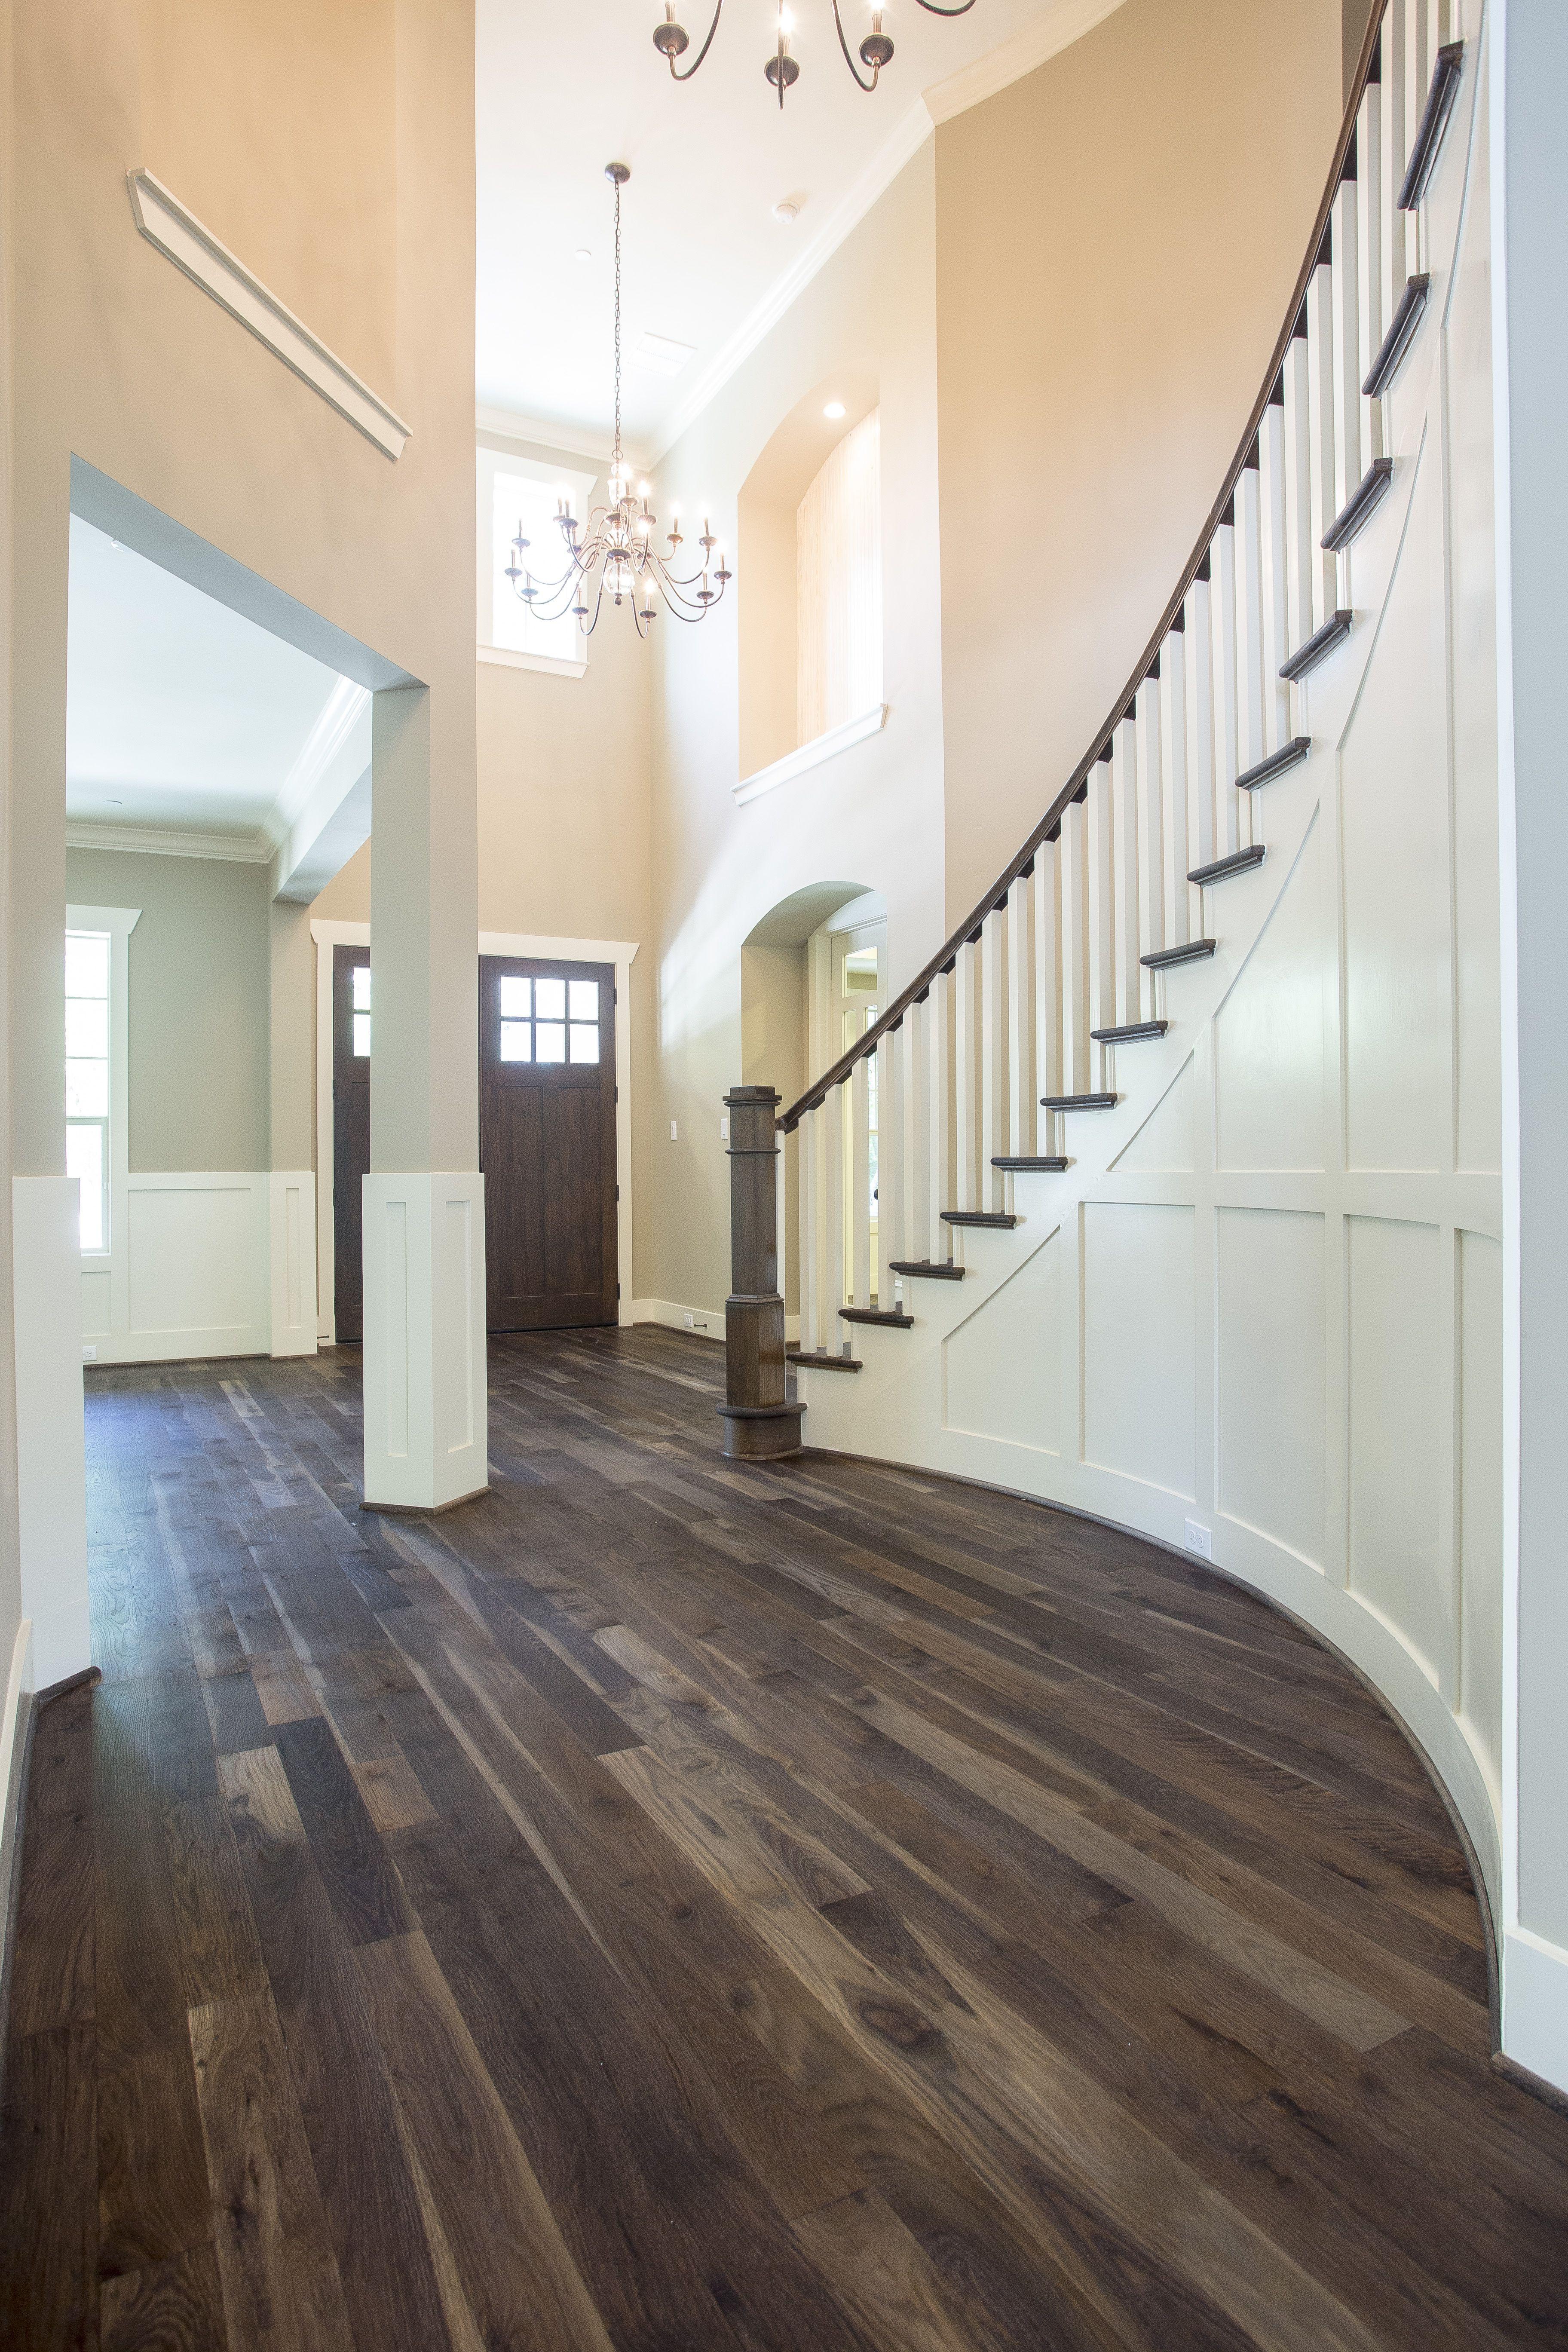 unfinished hardwood flooring houston of maxwell hardwood flooring inc mhfinc on pinterest for eaaf87607a9d381a976664af2ba07569